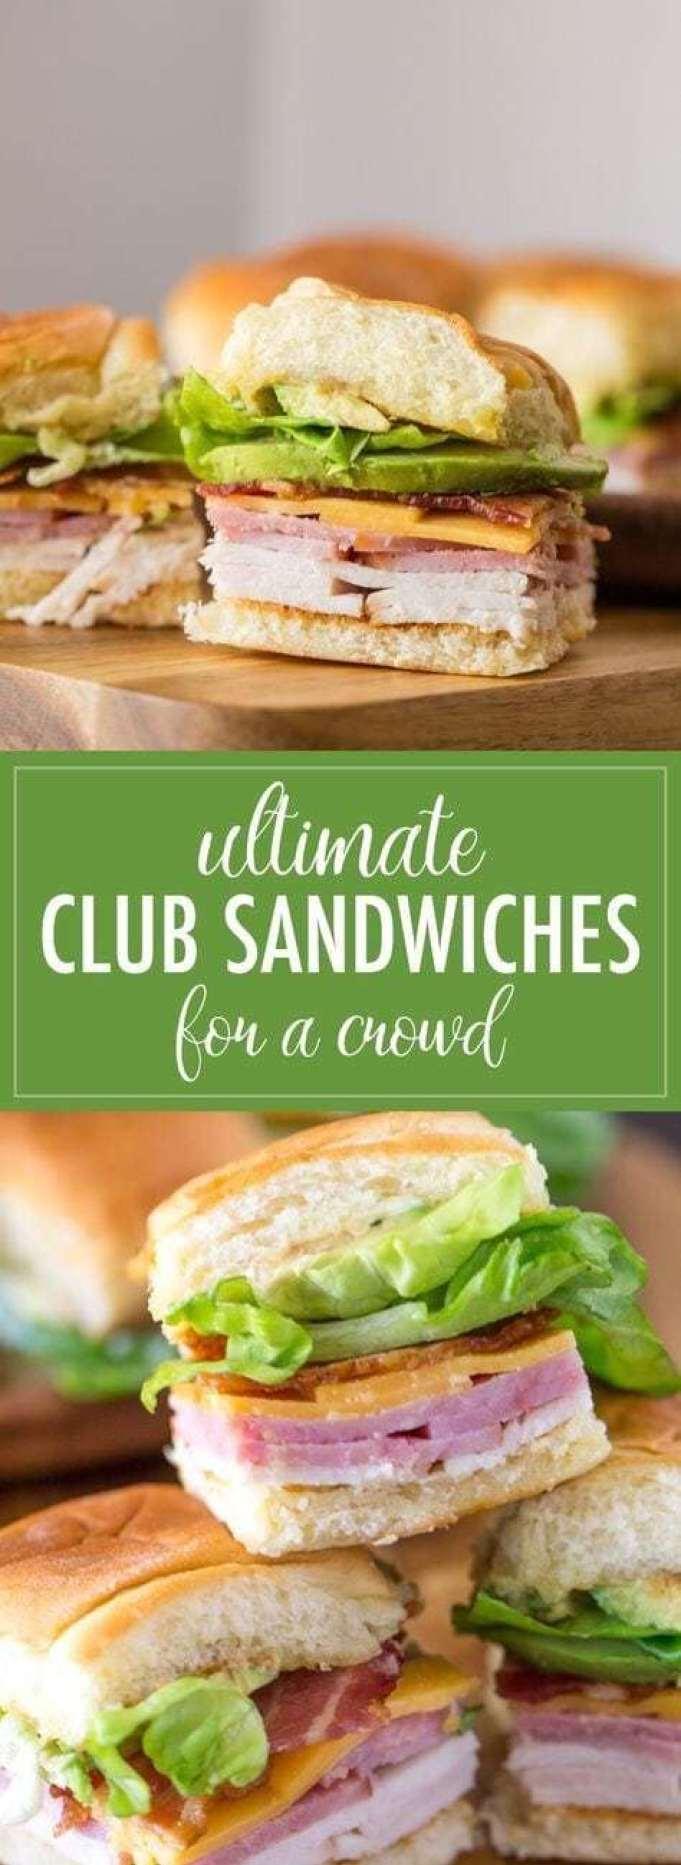 Ultimate Club Sandwiches - - 20 Best Croissant Sandwich Recipes